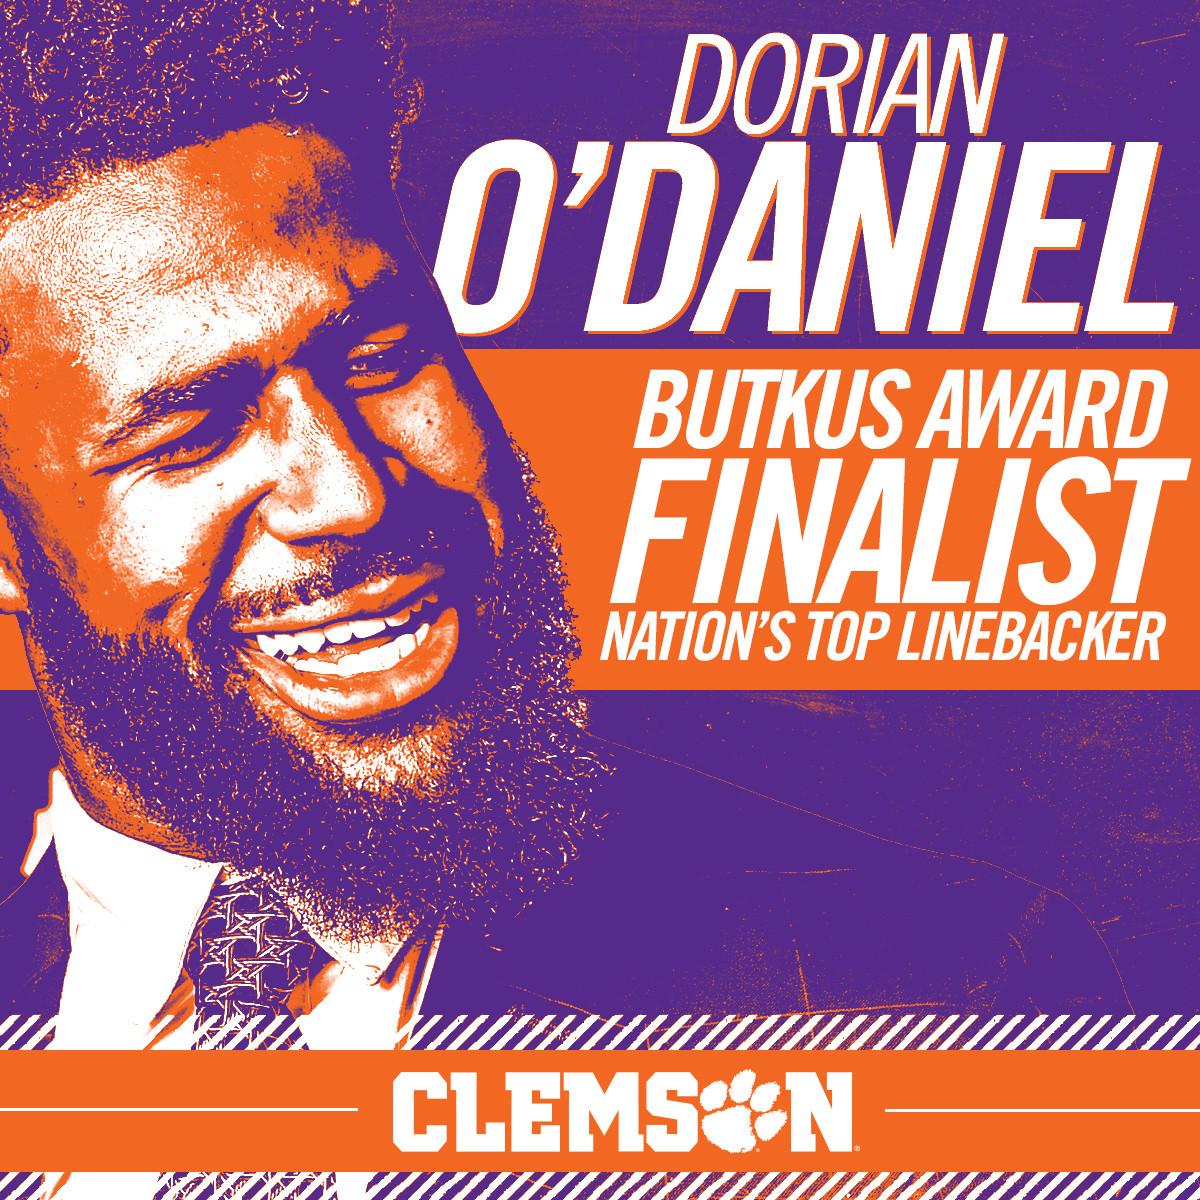 O'Daniel Named Butkus Finalist